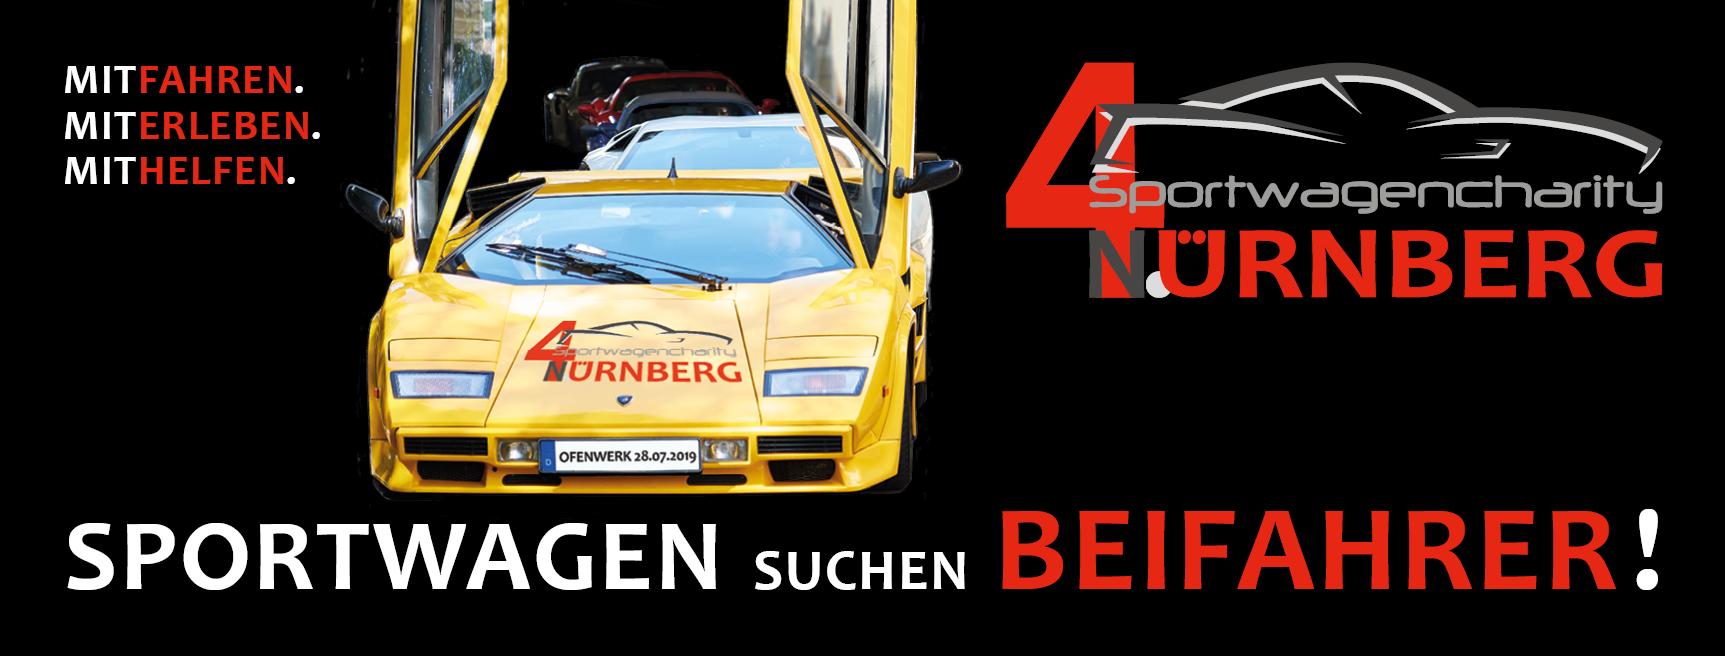 Die 4. Sportwagencharity Nürnberg startet am 28.7.2019, Ofenwerk Nürnberg – Frühförderteam ist Teil des Rahmenprogramms.